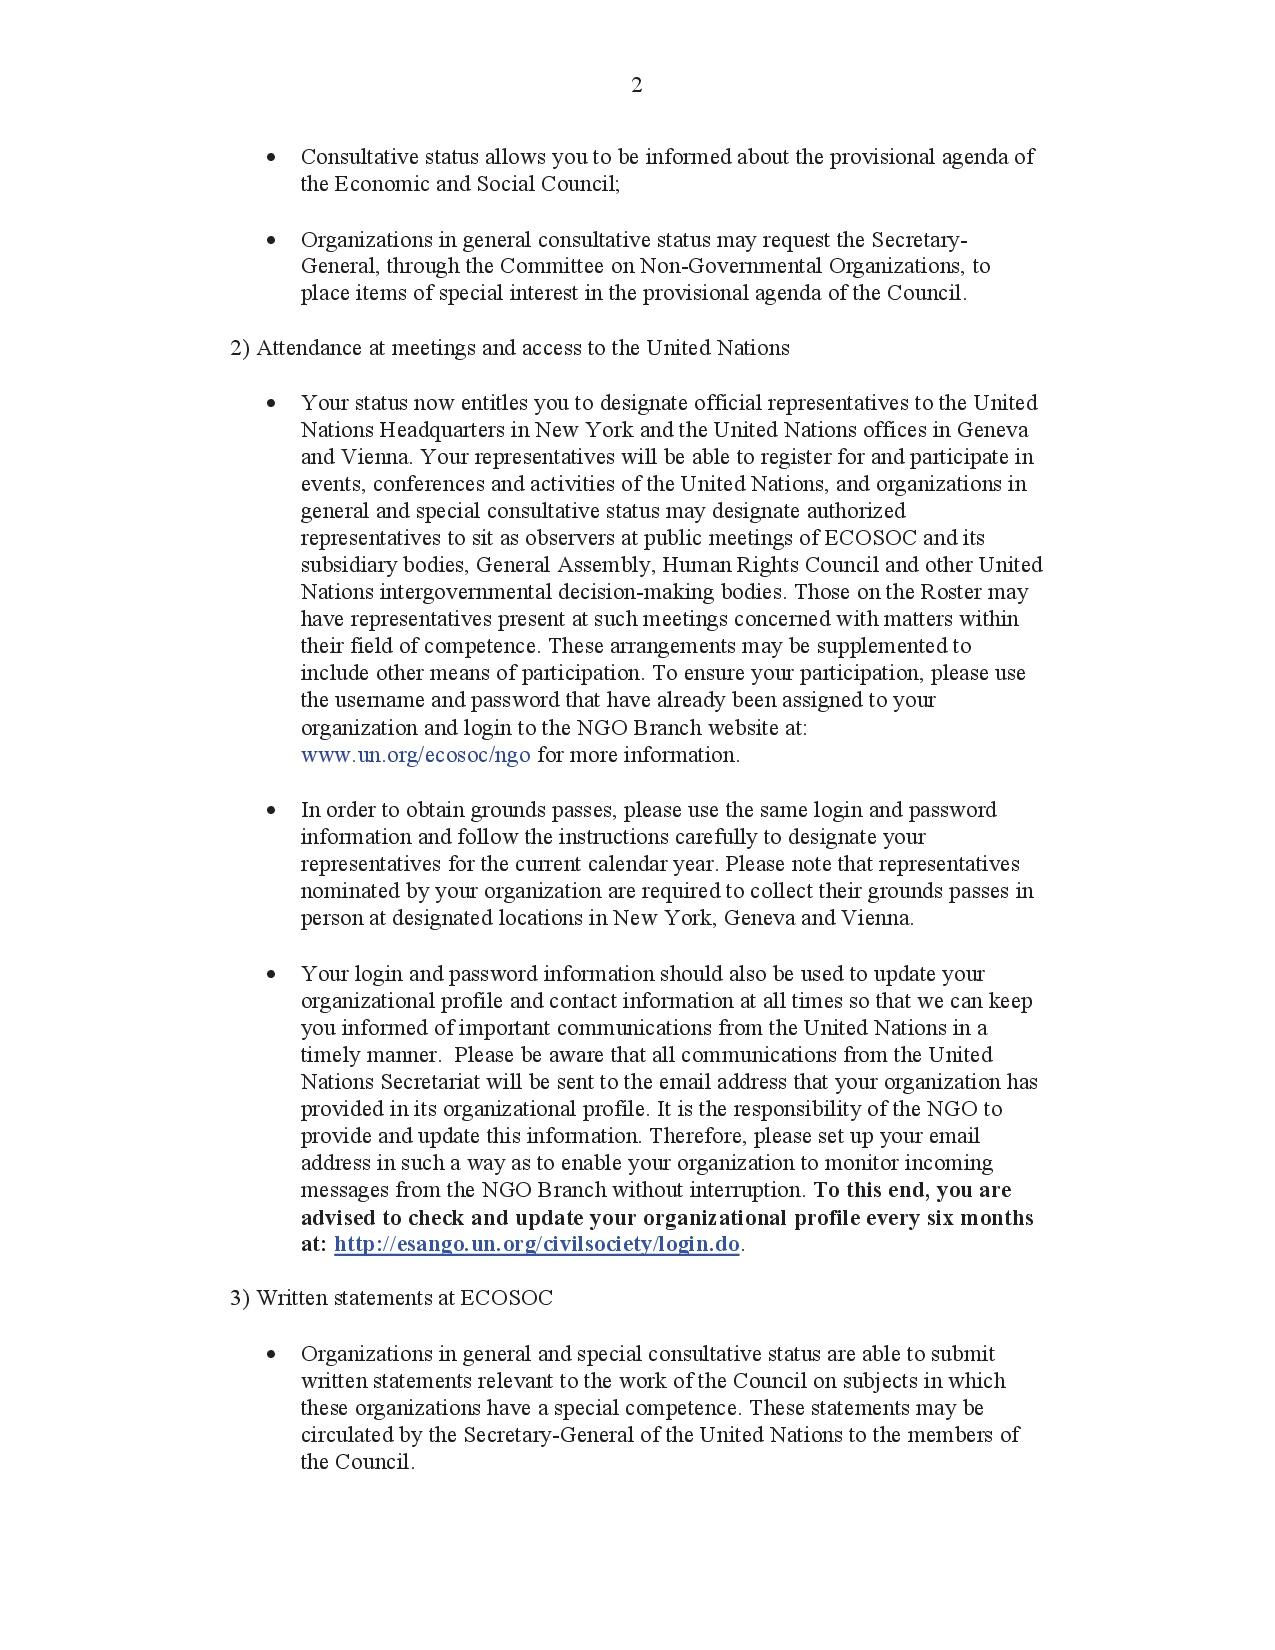 070-fed-internat-organisations-donneurs-sang-002